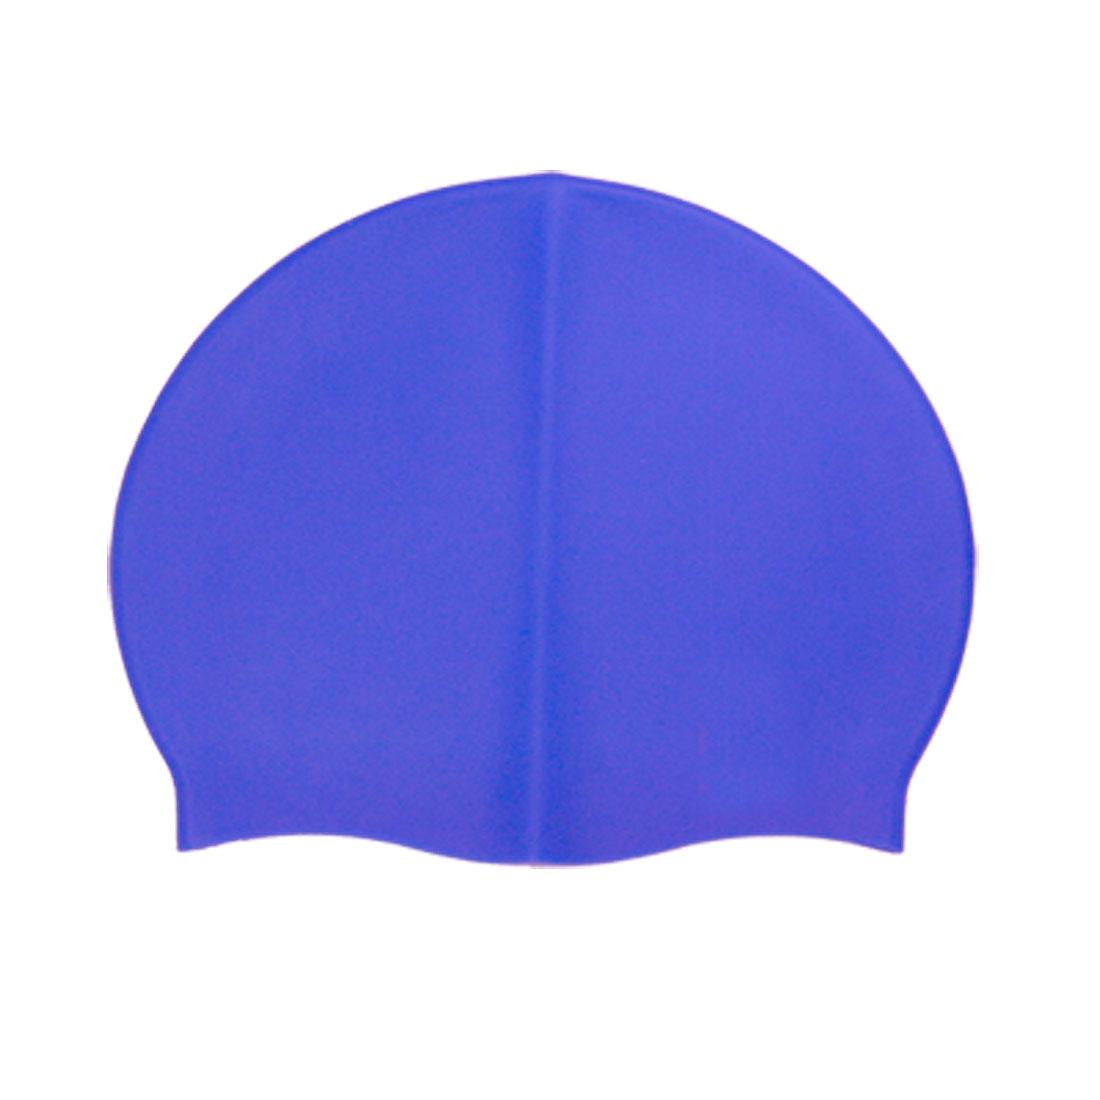 Blue Flexible Silicone Swimming Cap Swim Hat for Swimmer